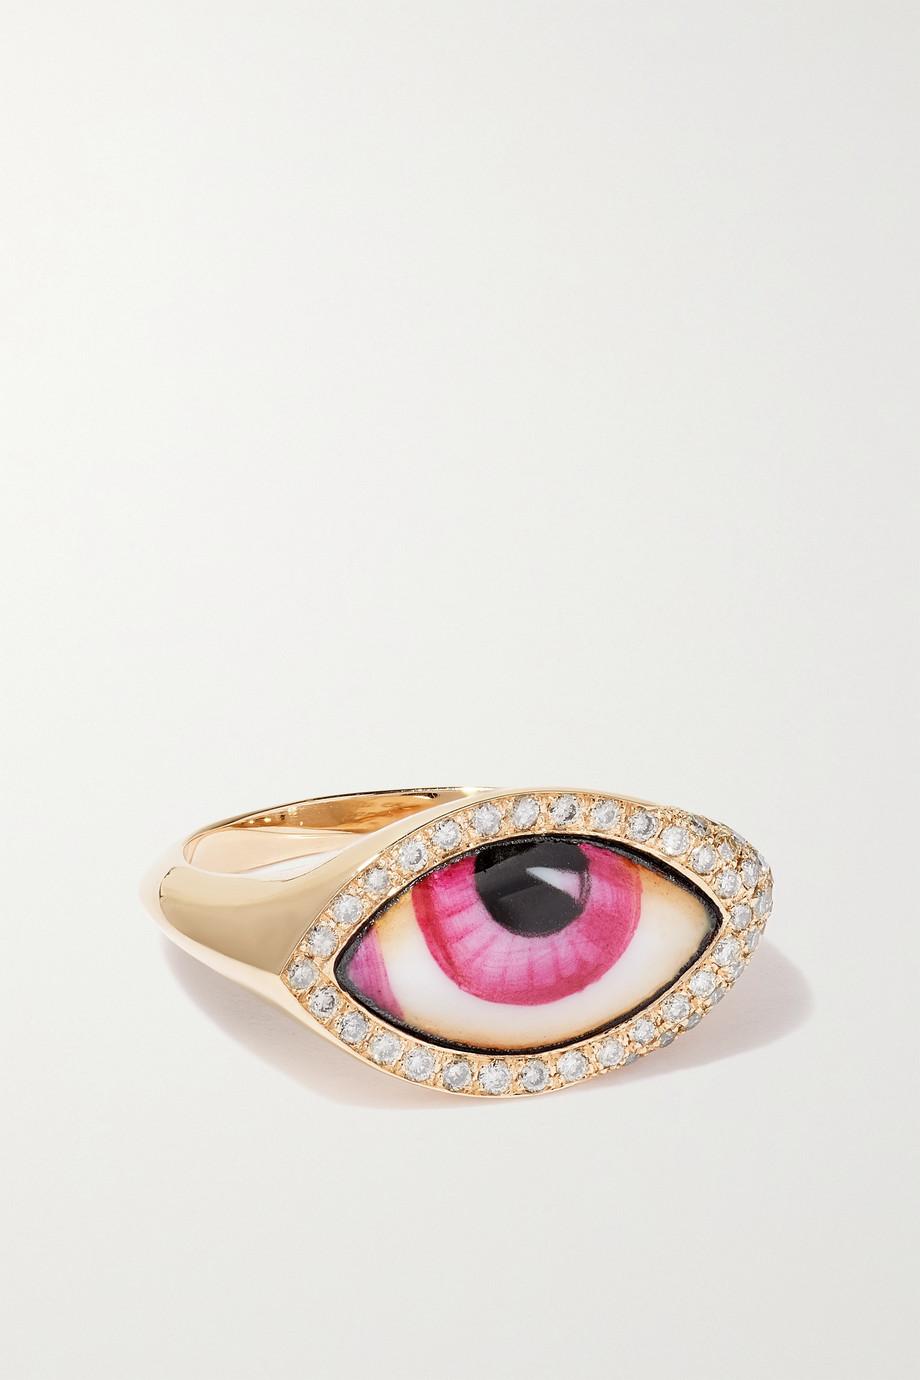 Lito Petite Pink Chevalier 14-karat gold, enamel and diamond ring